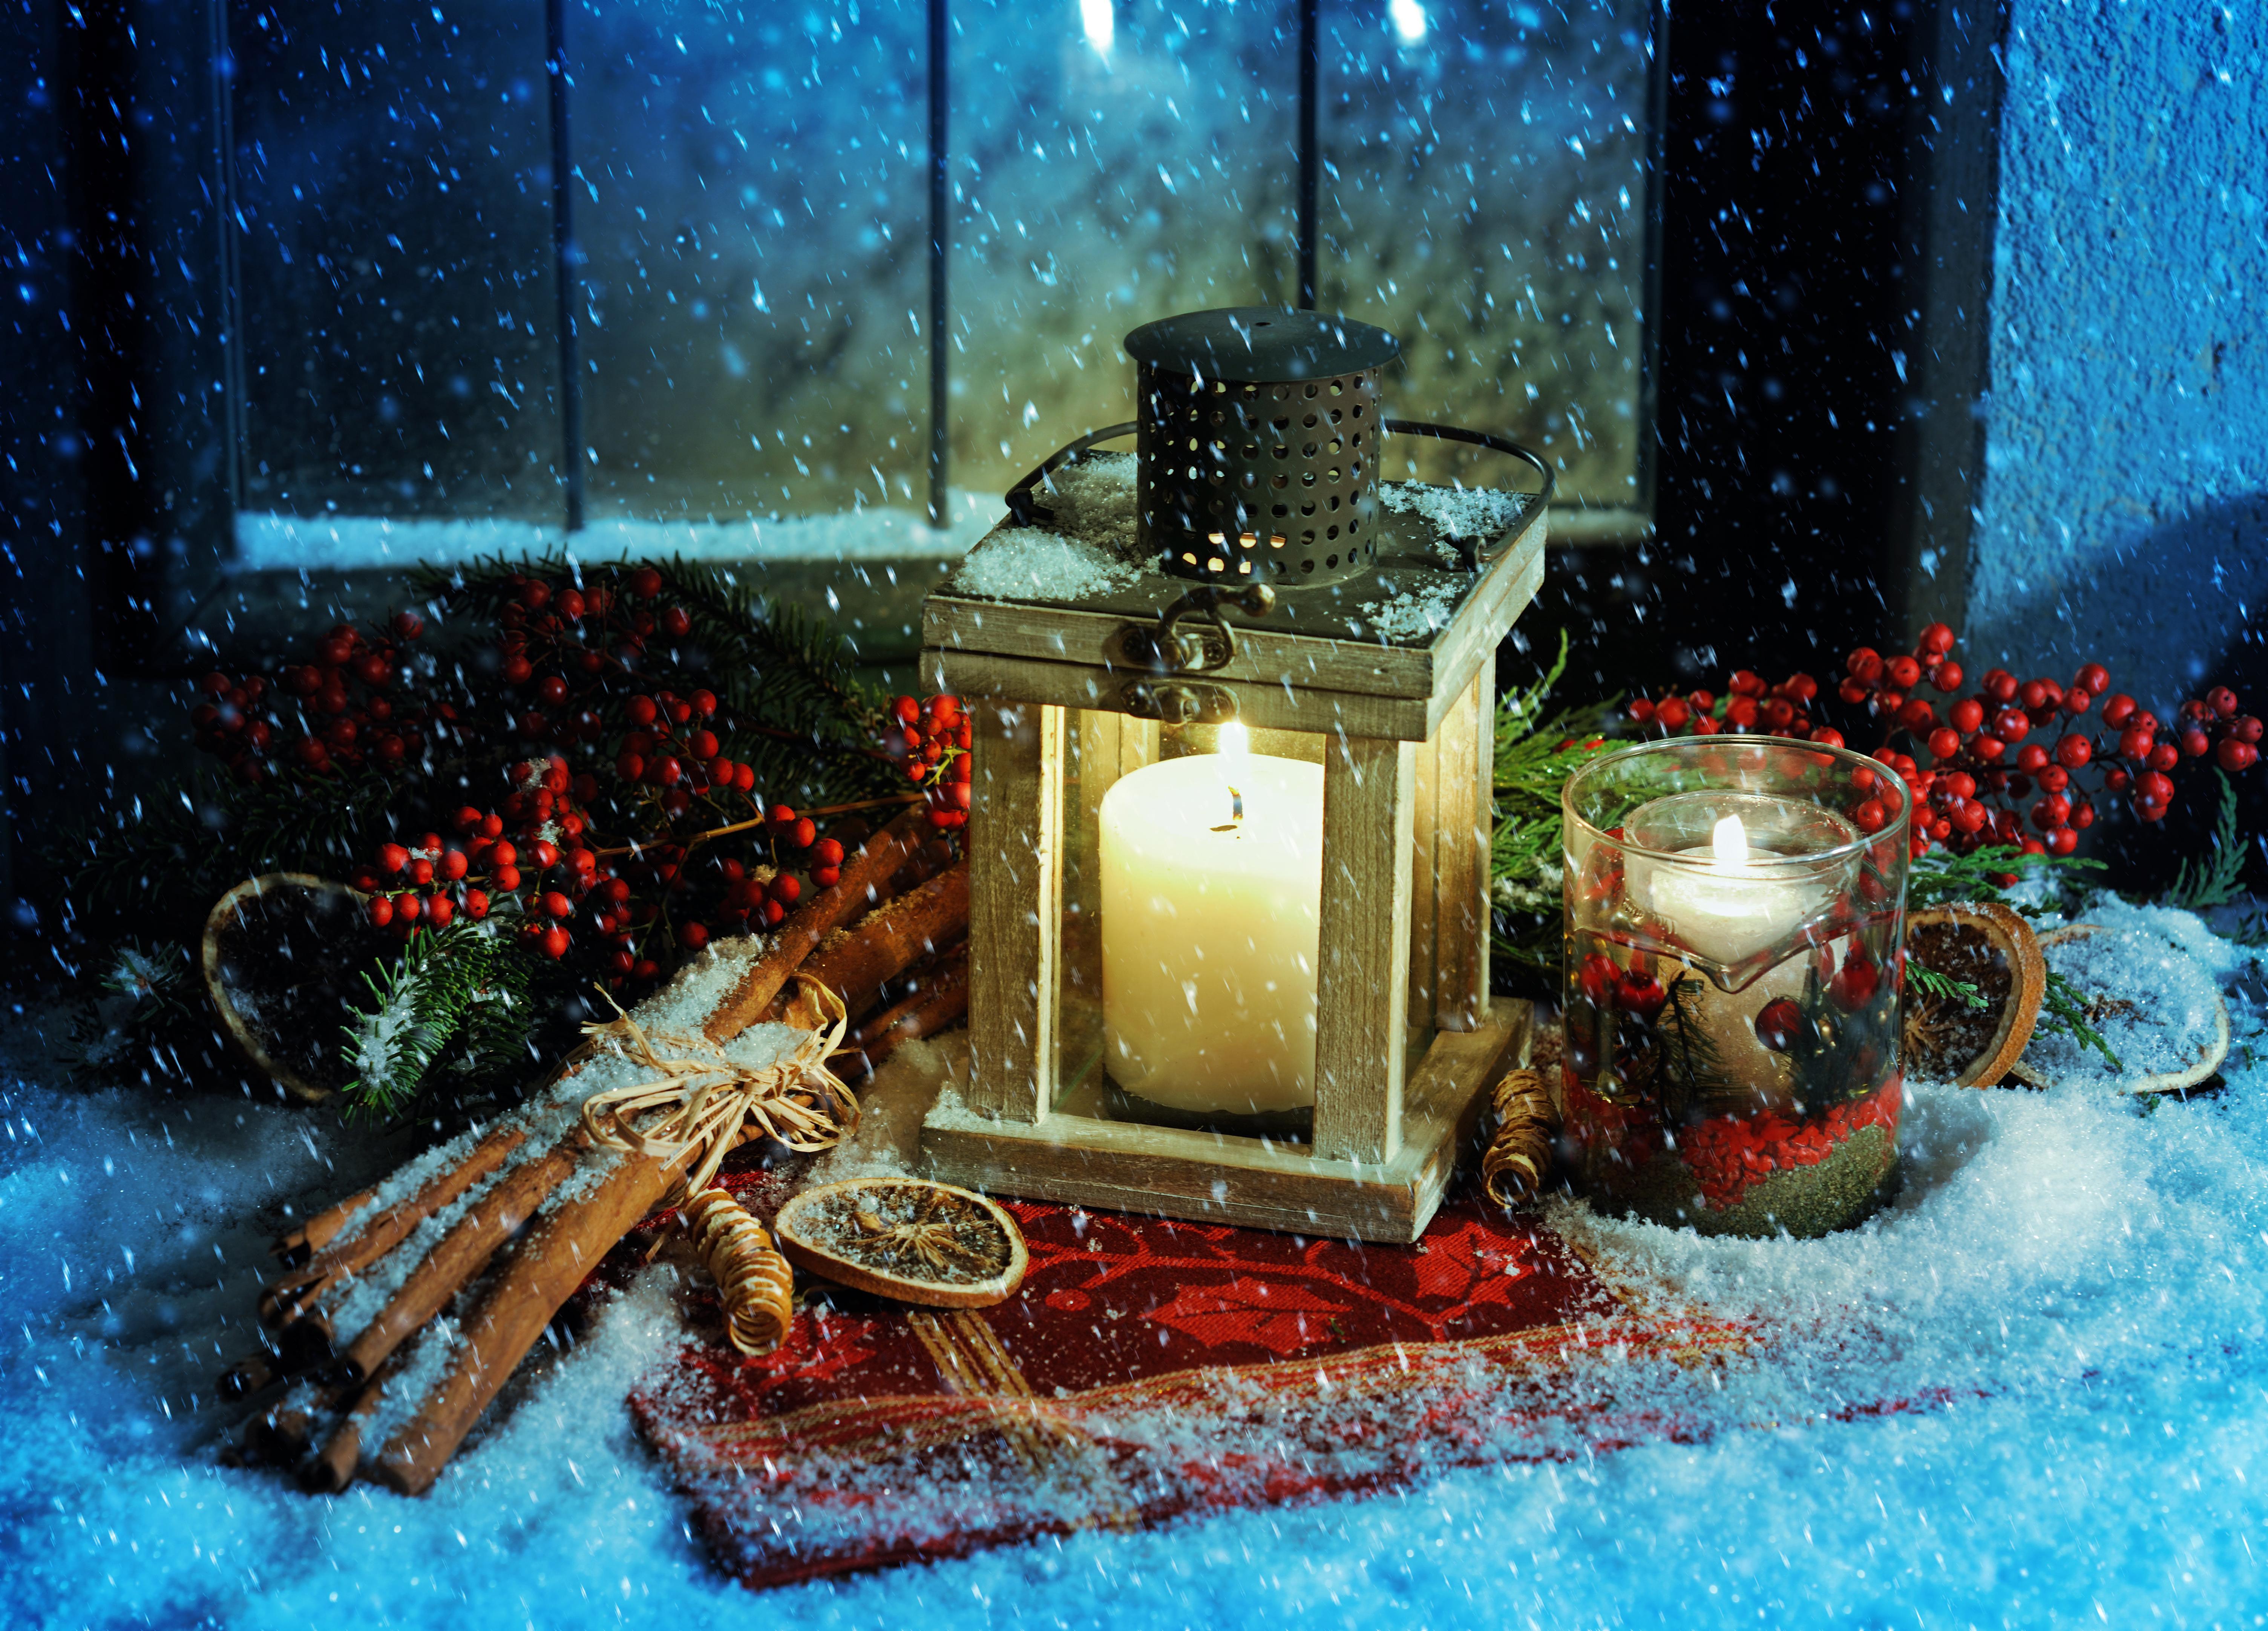 лампа свеча снег рождество lamp candle snow Christmas  № 3982689 бесплатно